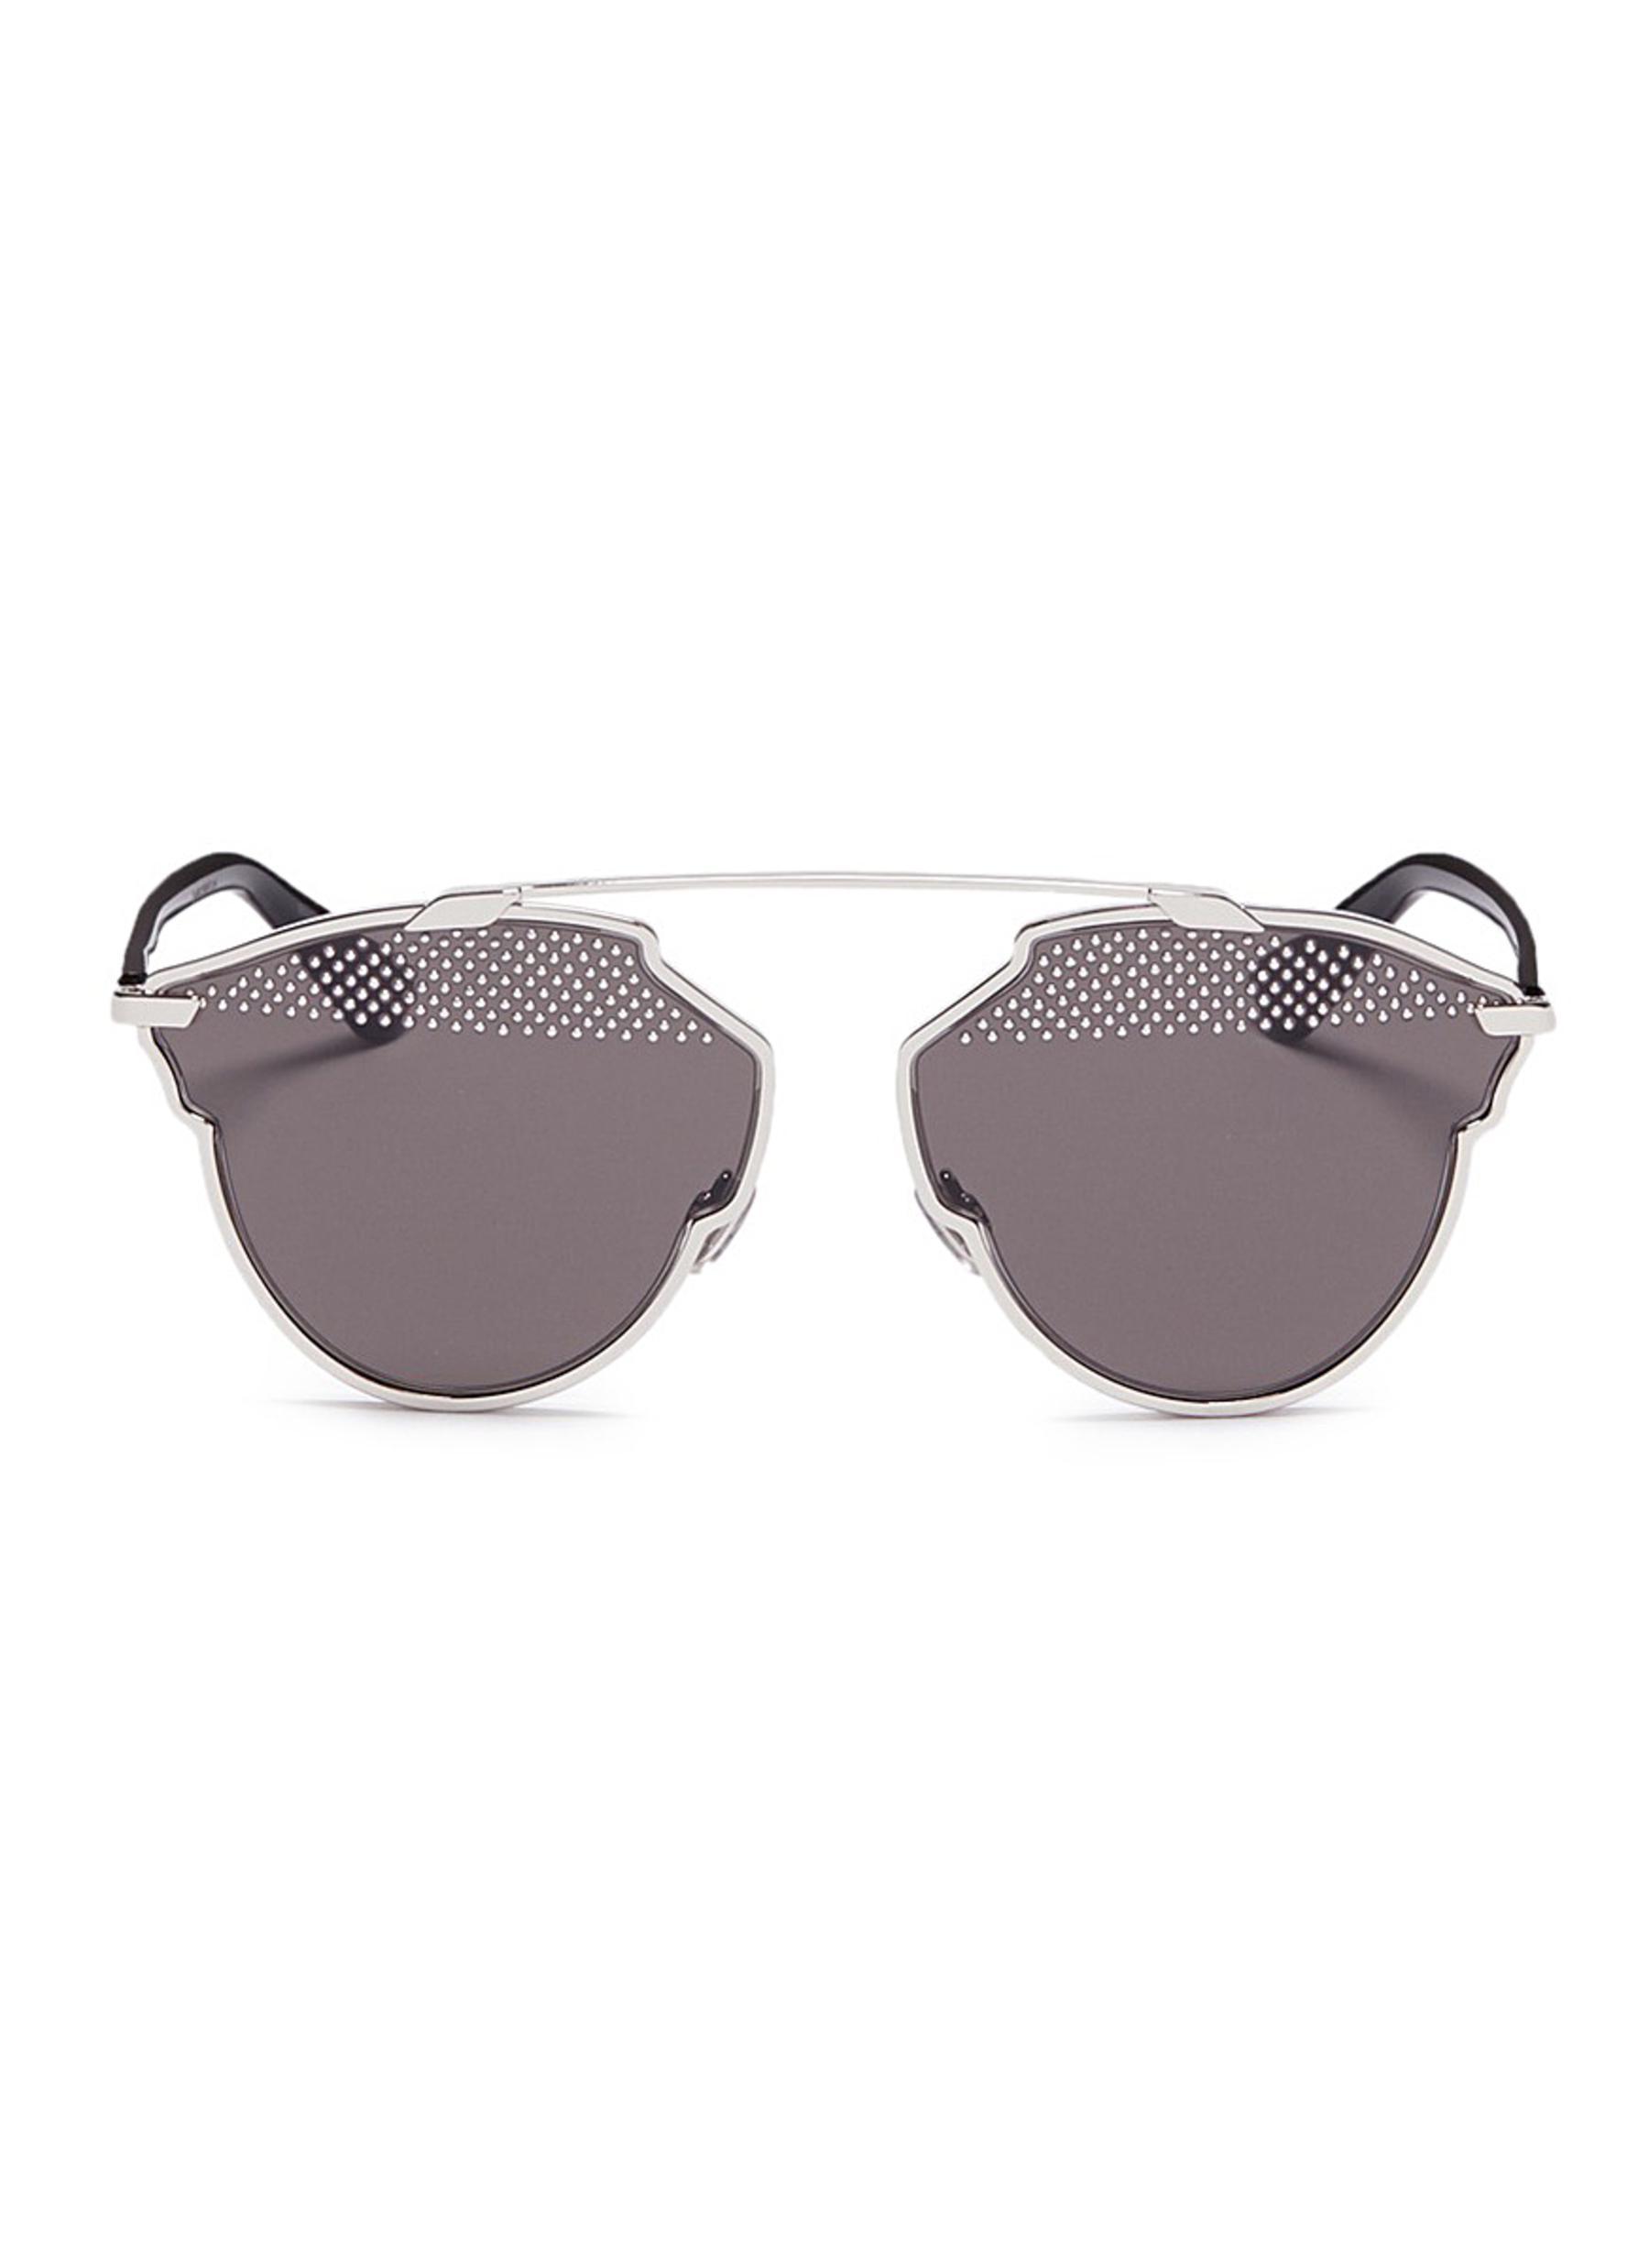 Sunglasses with Studded Lenses - White Dior 0cZsWBwf